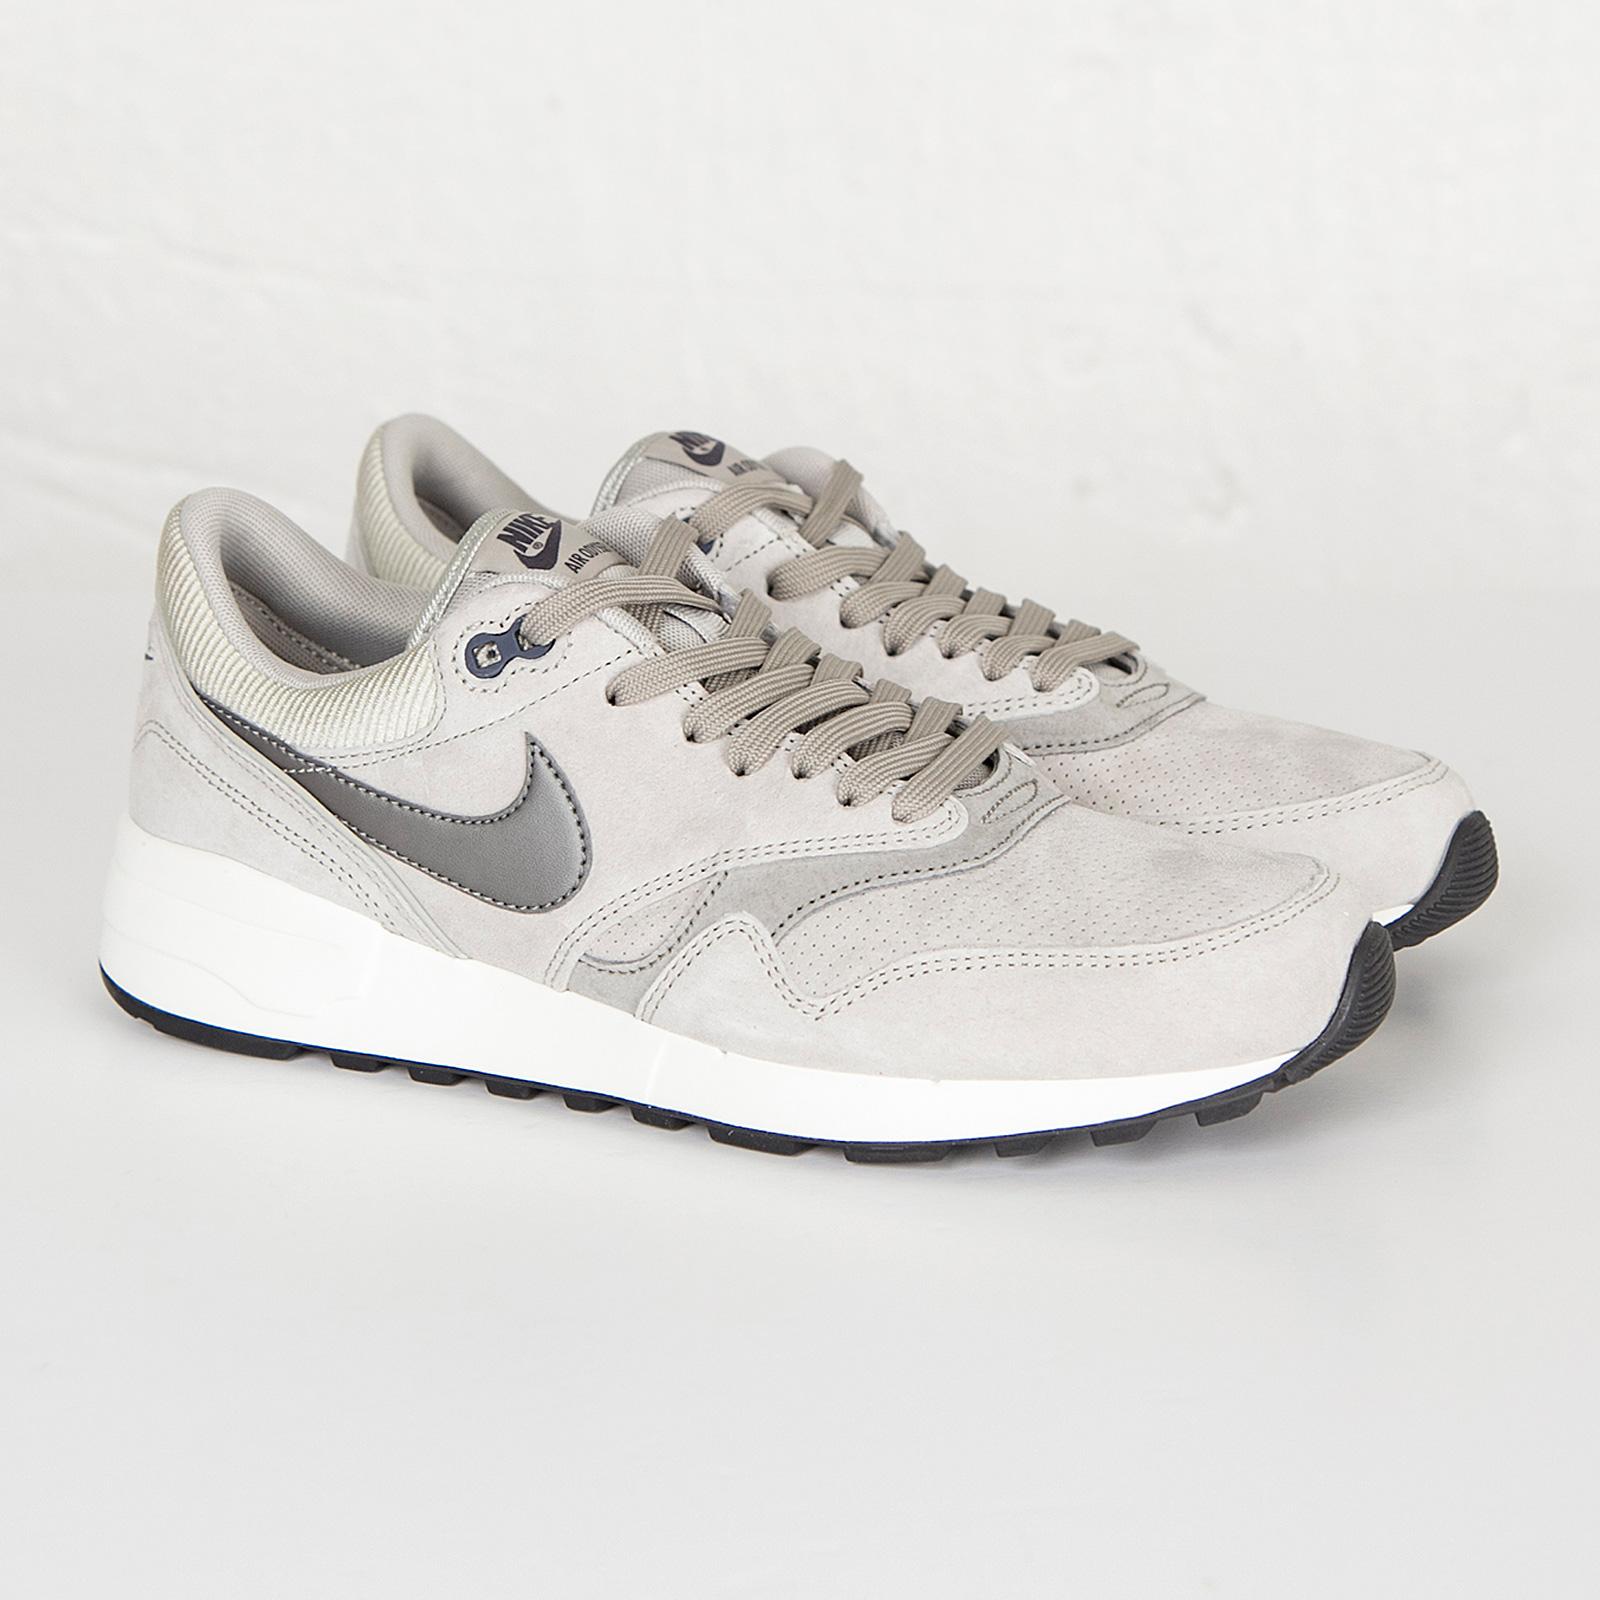 65926e24042e Nike Air Odyssey Leather - 684773-009 - Sneakersnstuff